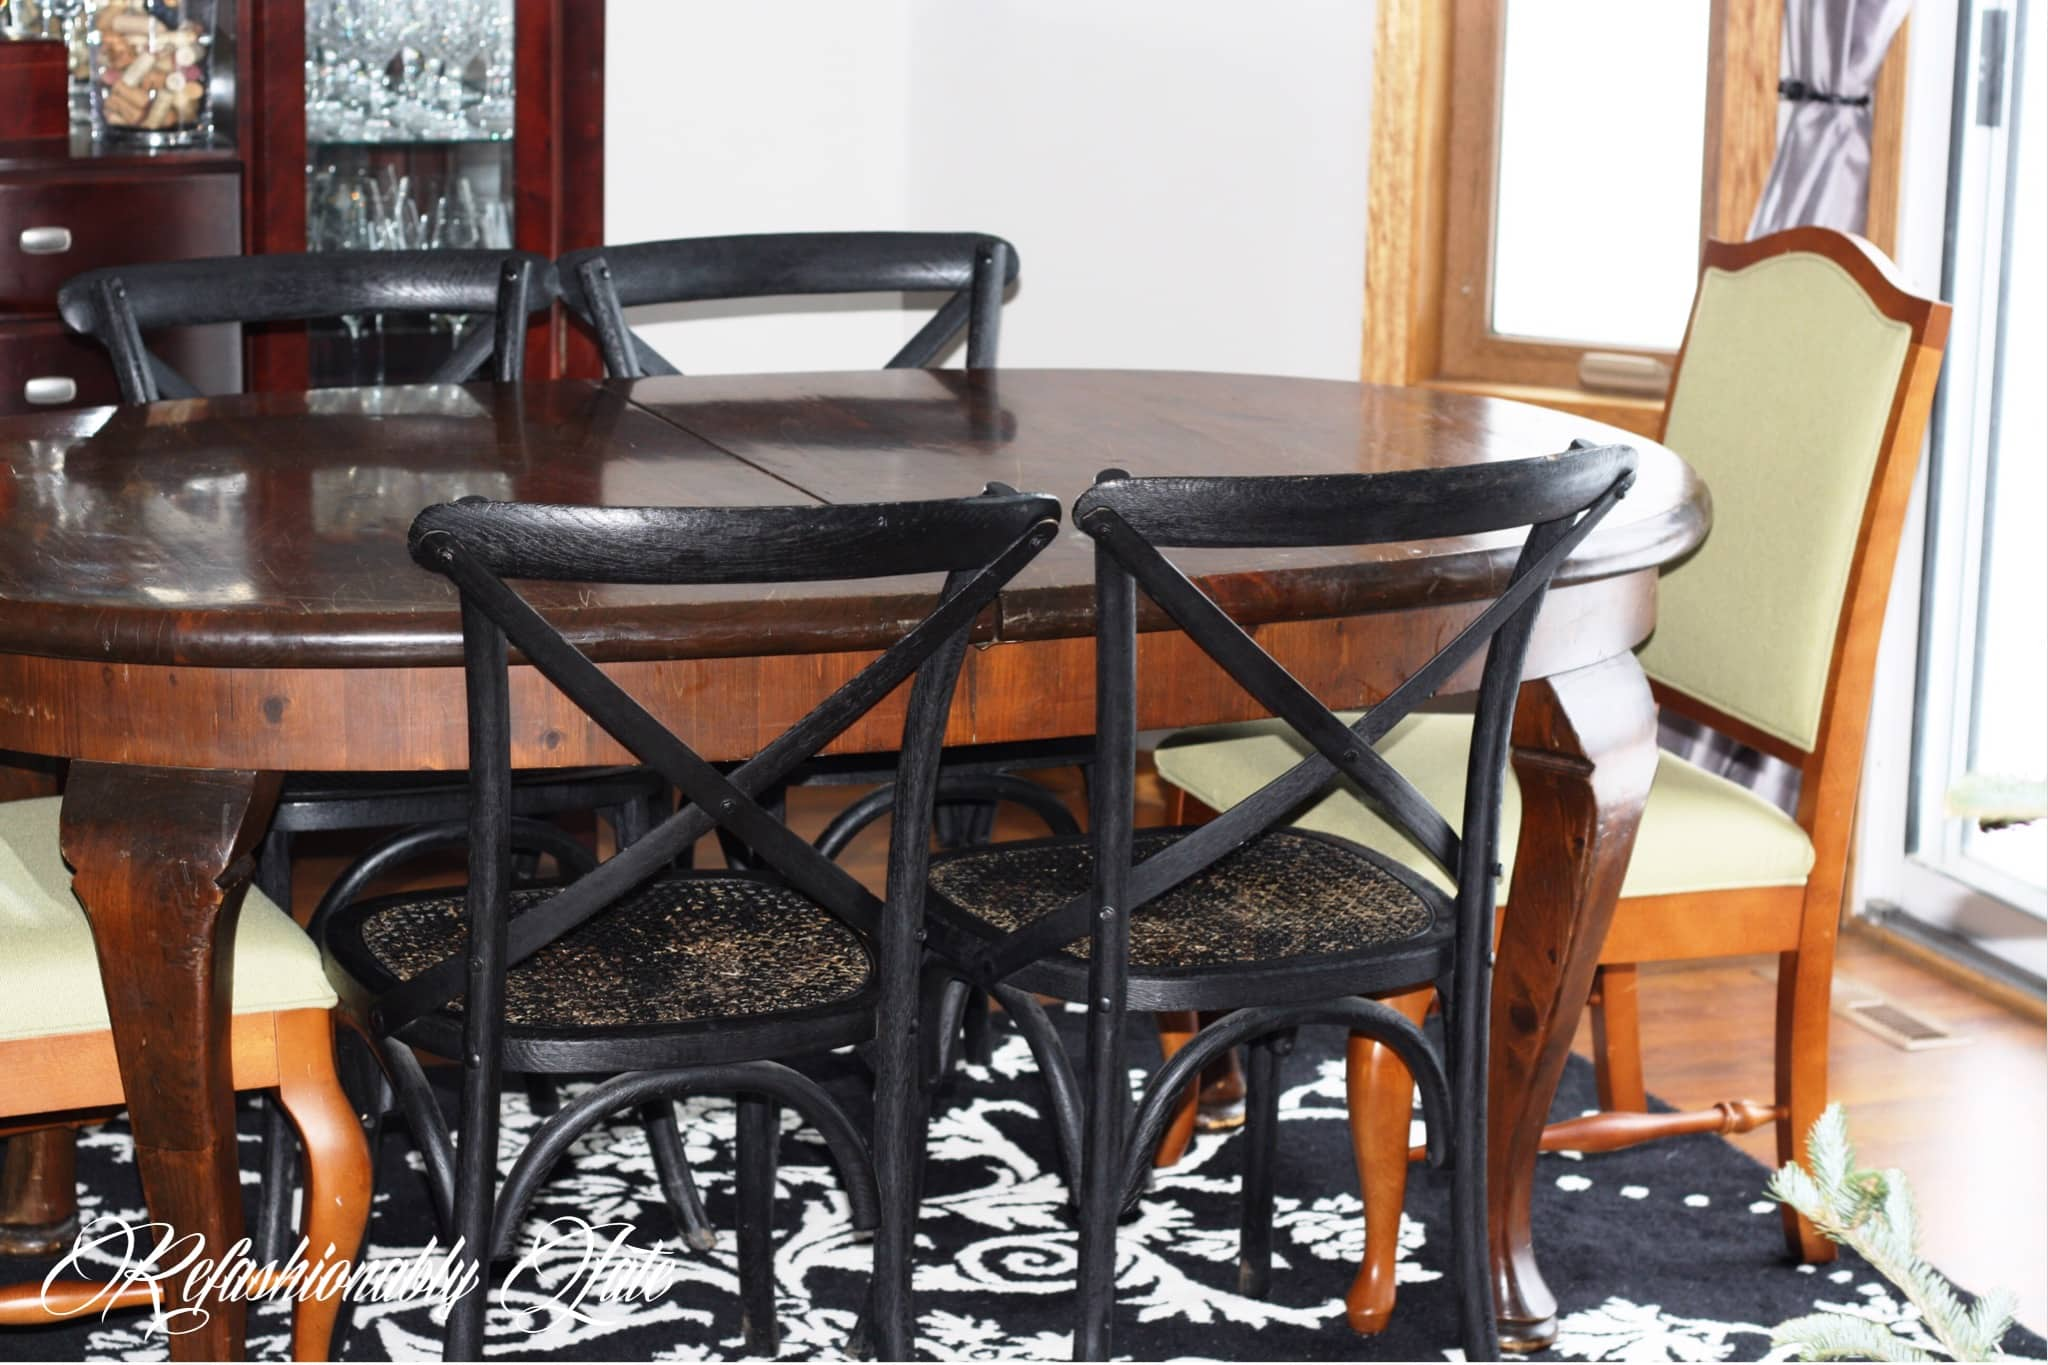 Restored Restoration Hardware Chairs   Www.refashionablylate.com